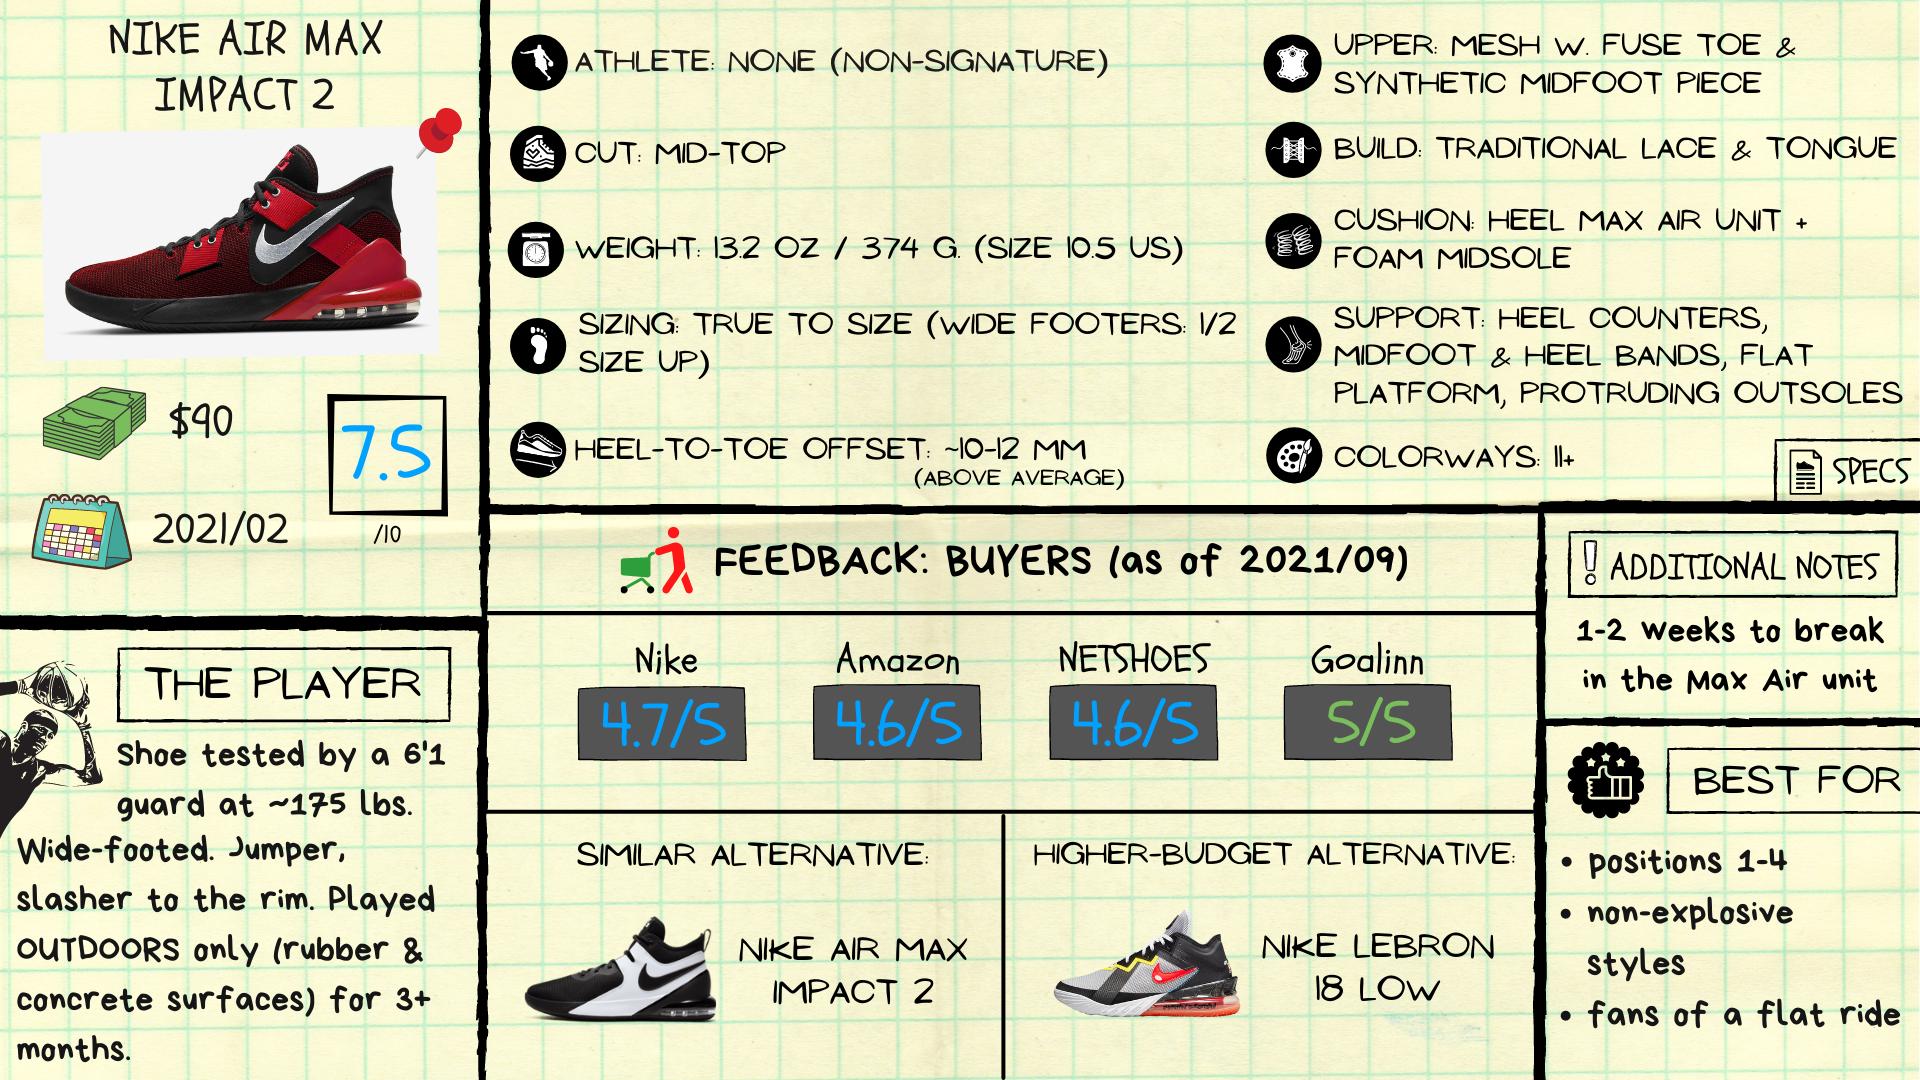 Nike Air Max Impact Review: Spec Sheet